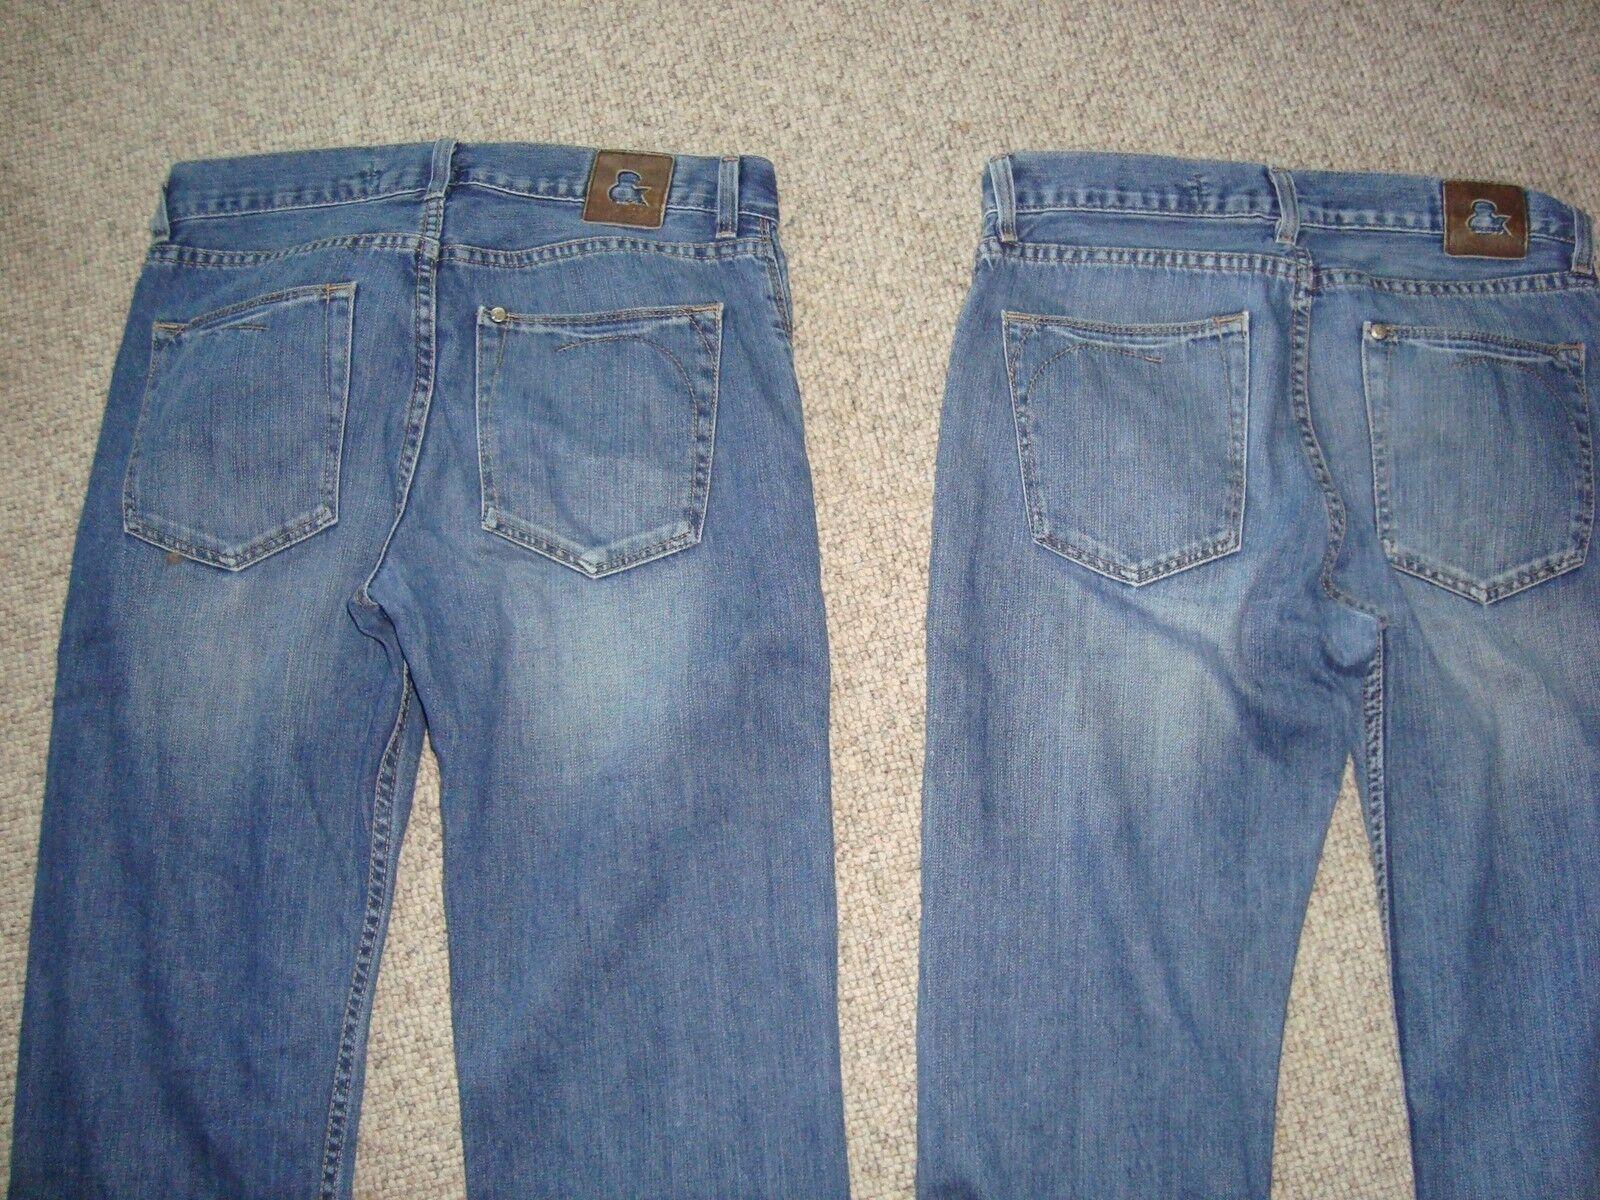 Jeans, Denimjeans cowboybukser,